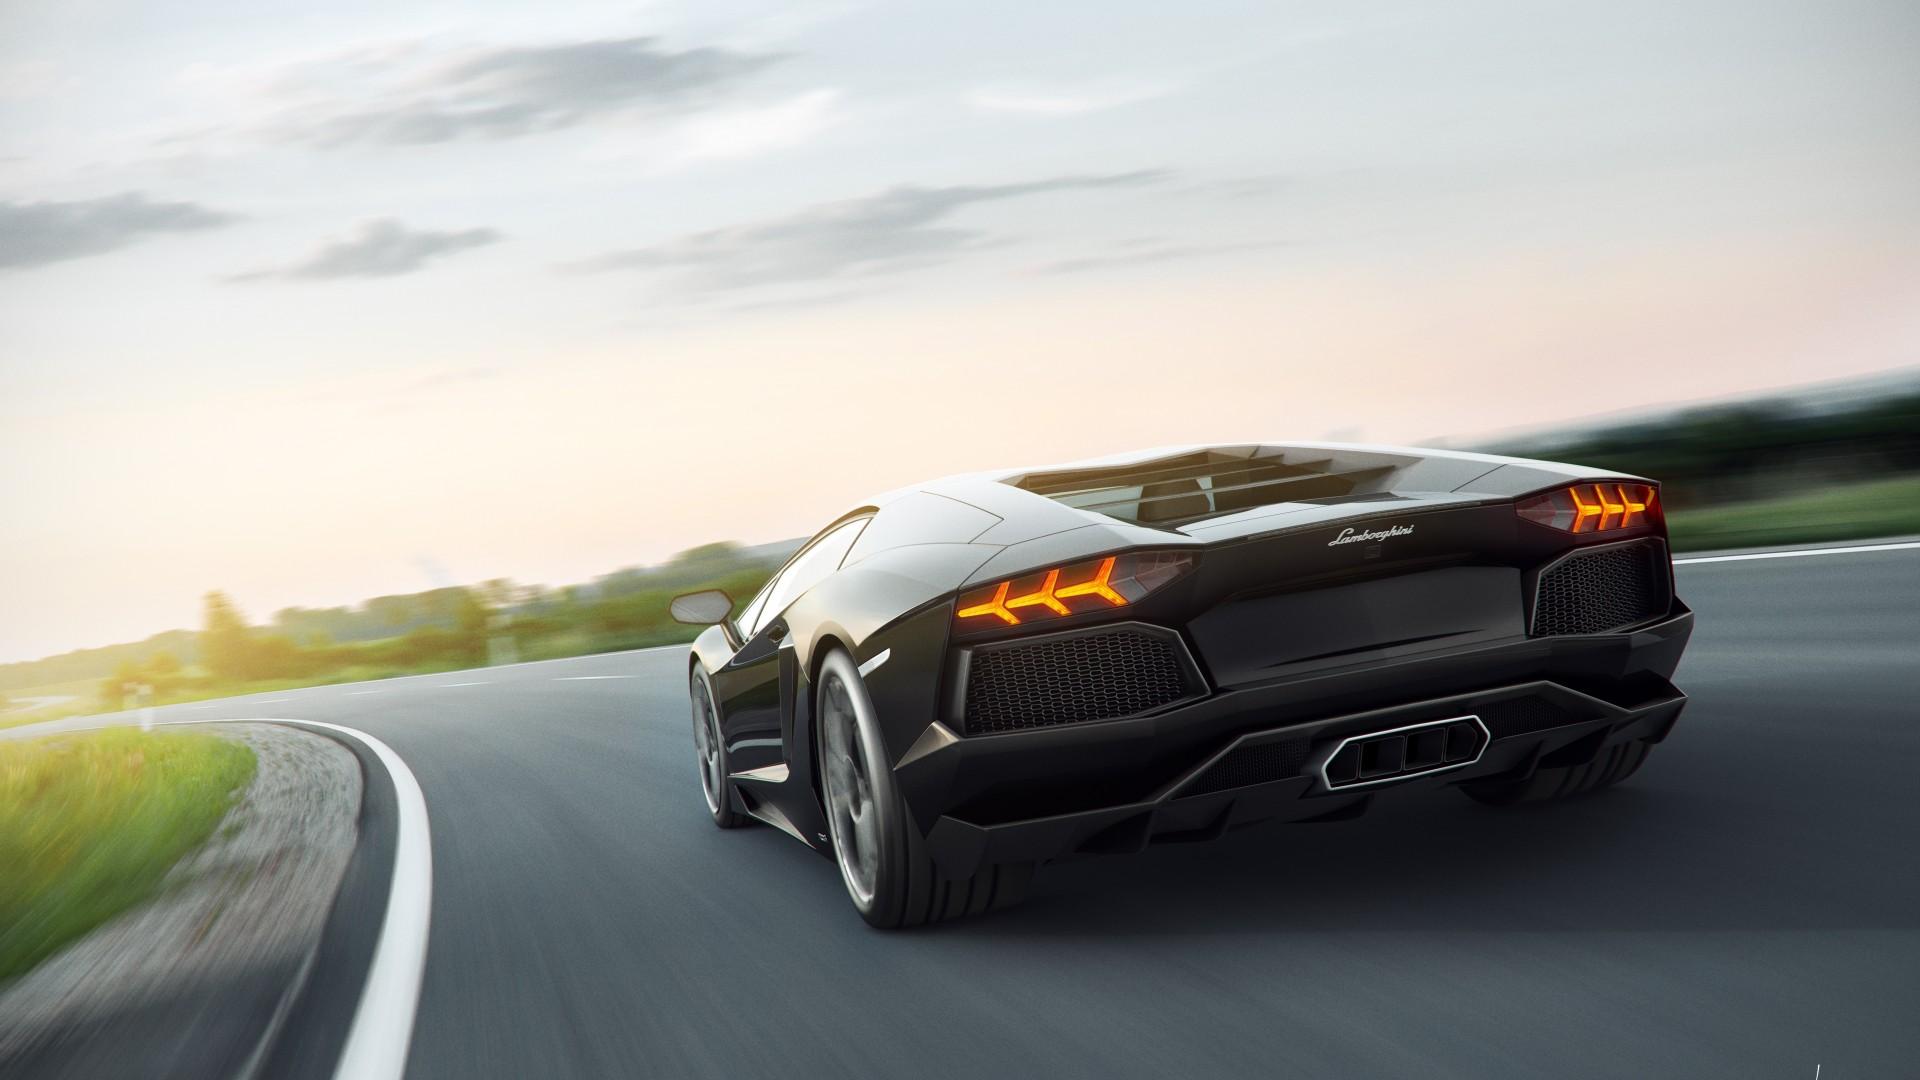 Lamborghini 5k 4k Wallpaper 8k Supercar Aventador Black Horizontal